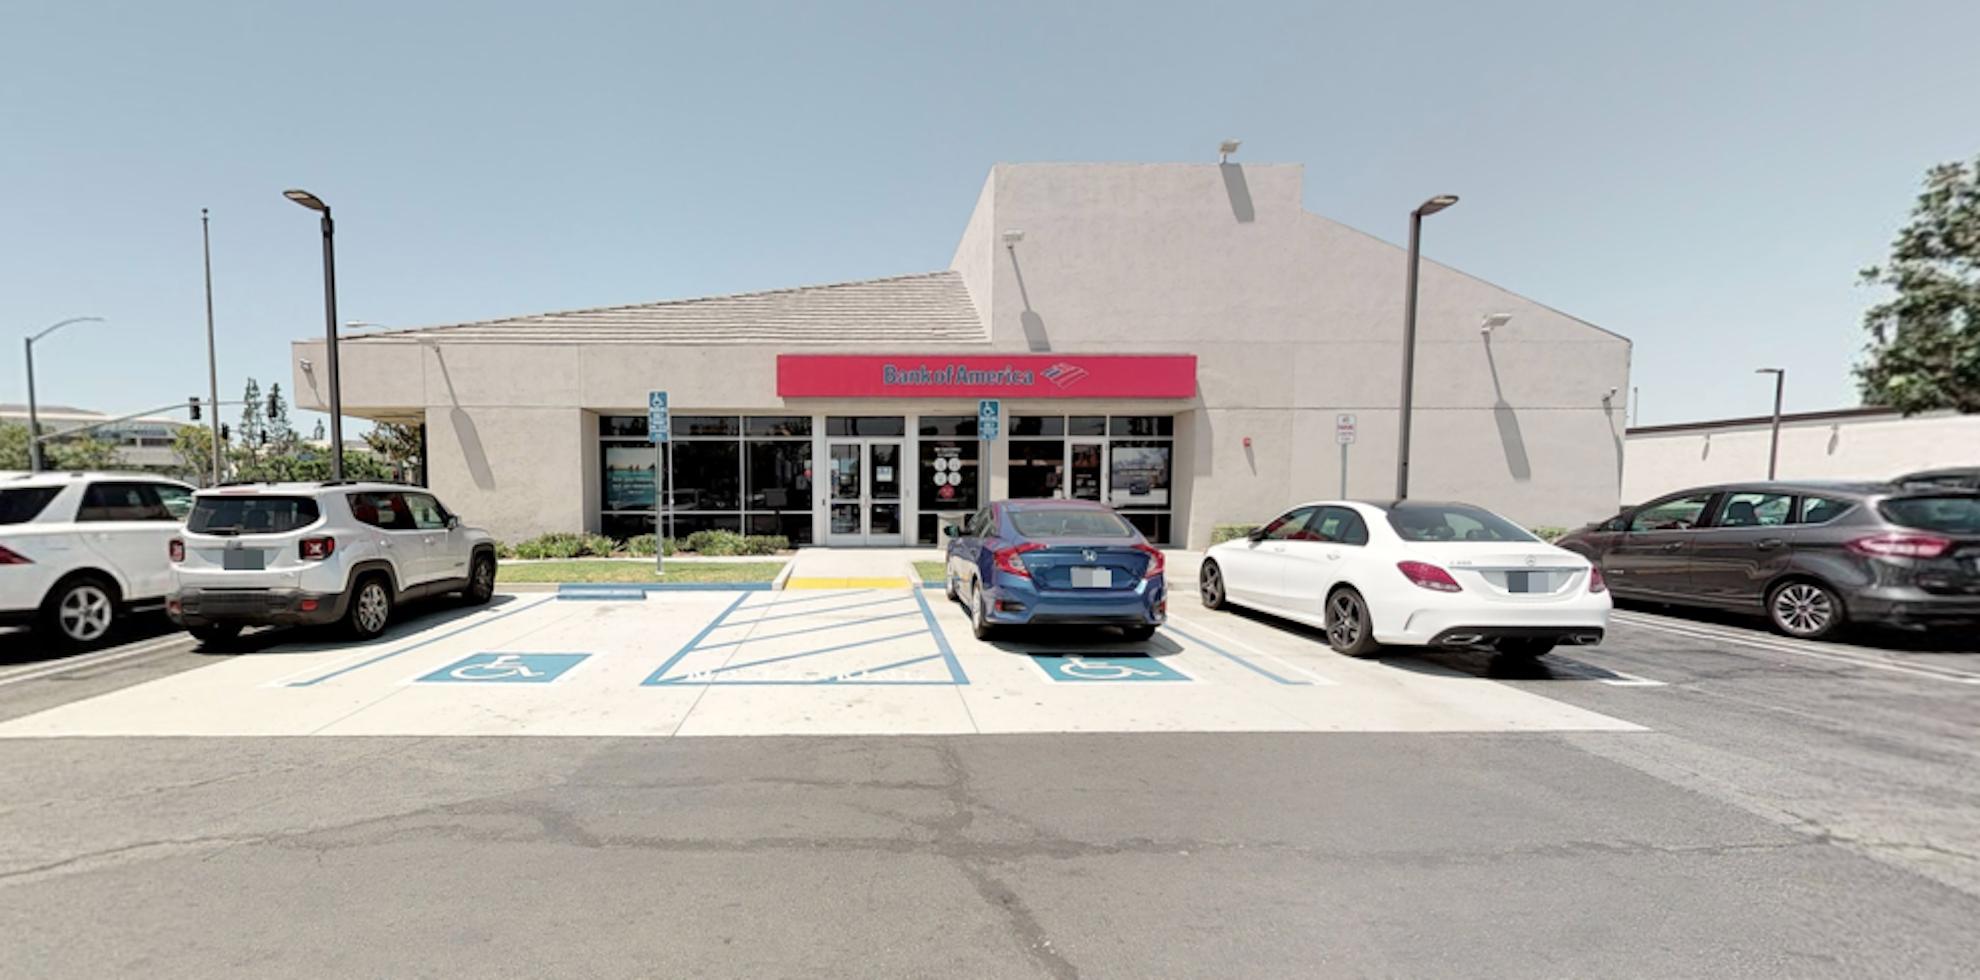 Bank of America financial center with drive-thru ATM   6210 Beach Blvd, Buena Park, CA 90621